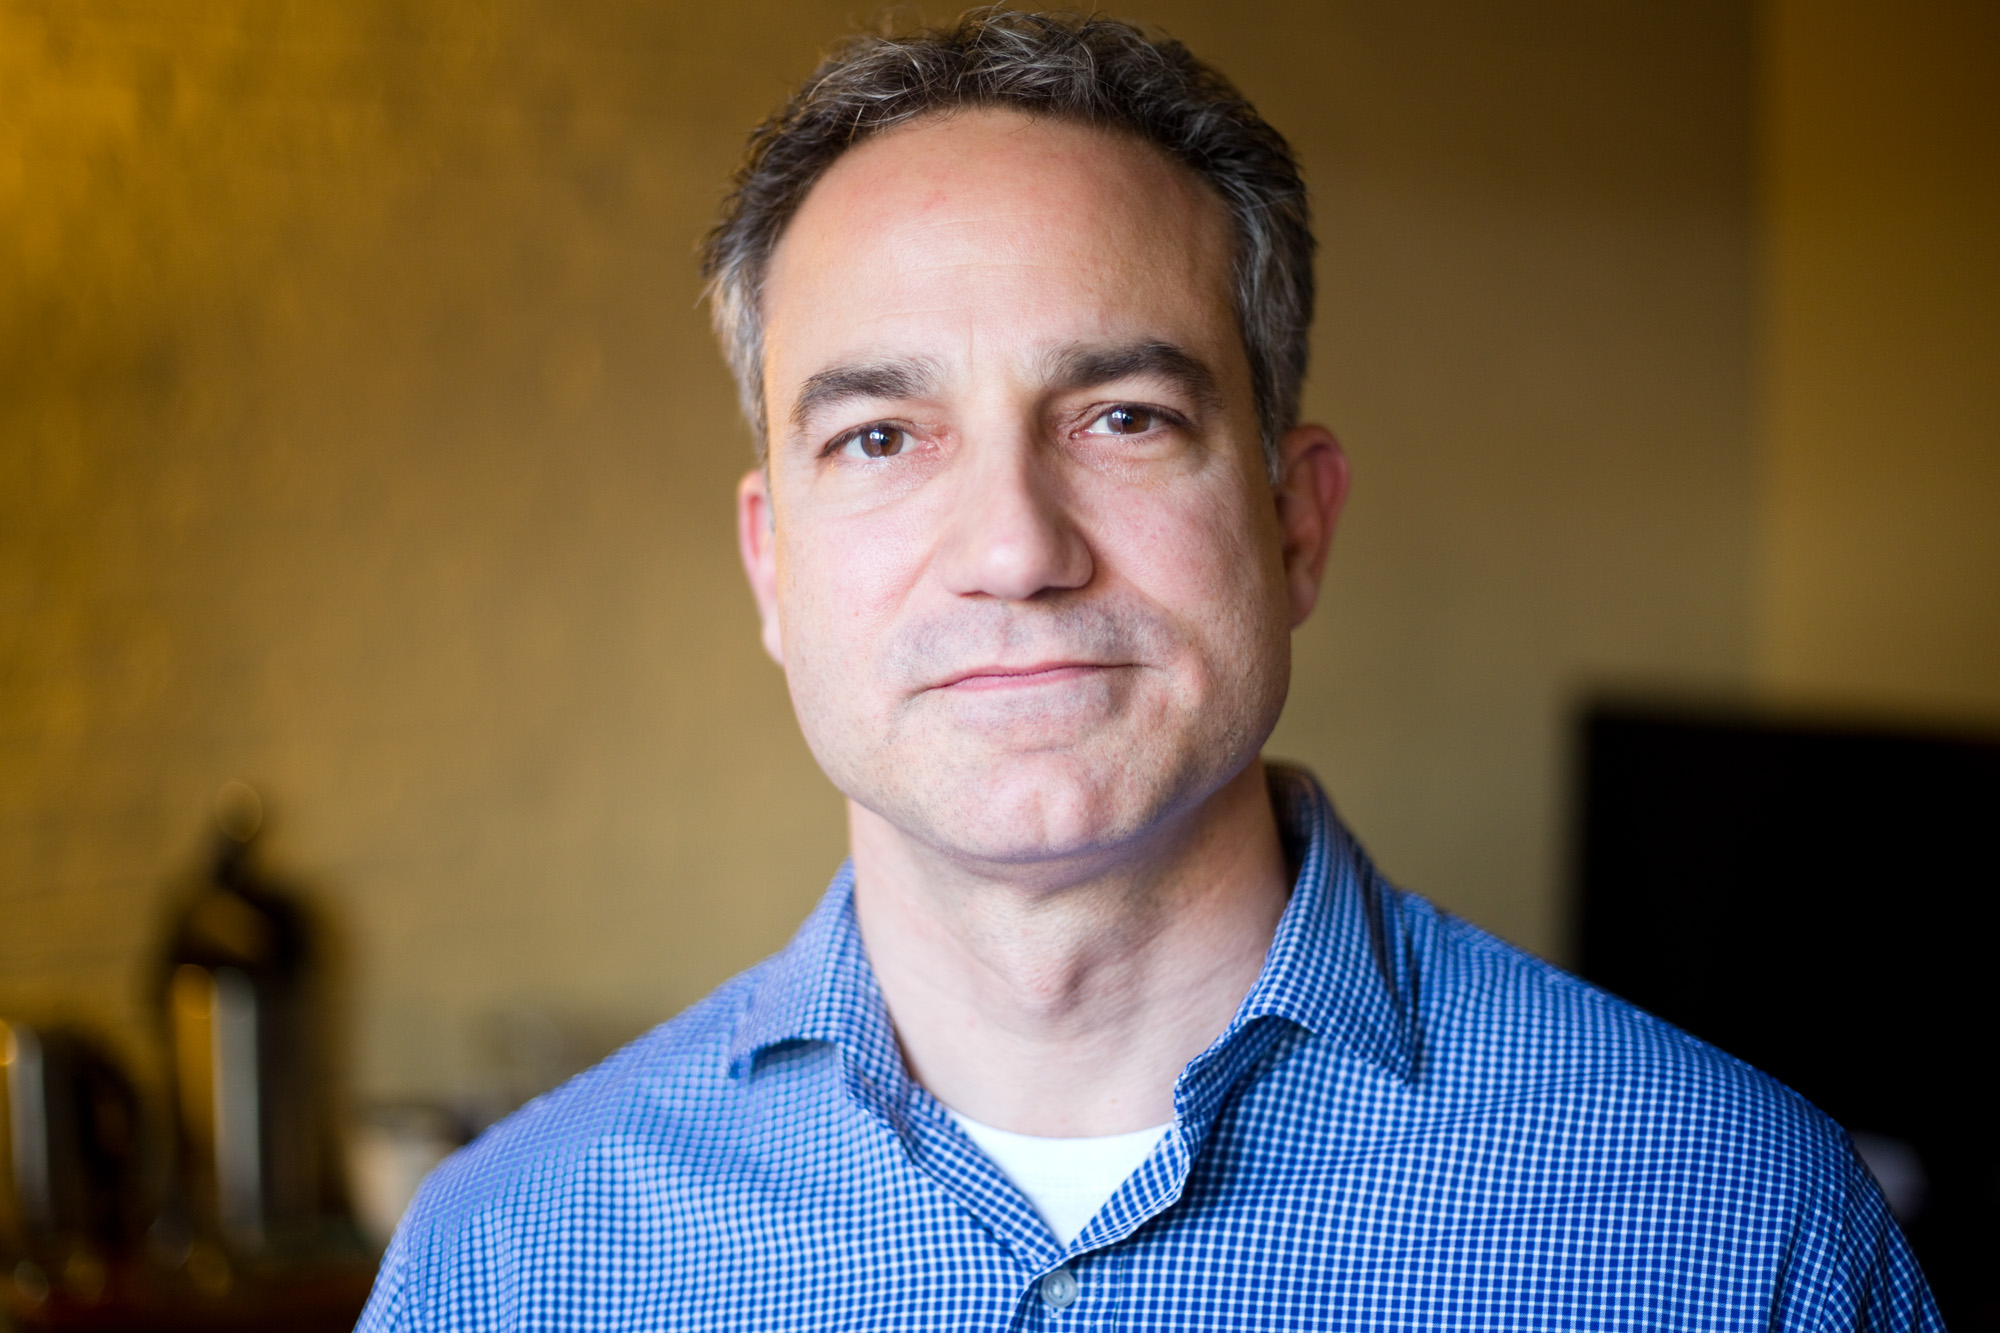 Bill Moseley, 49, at his office